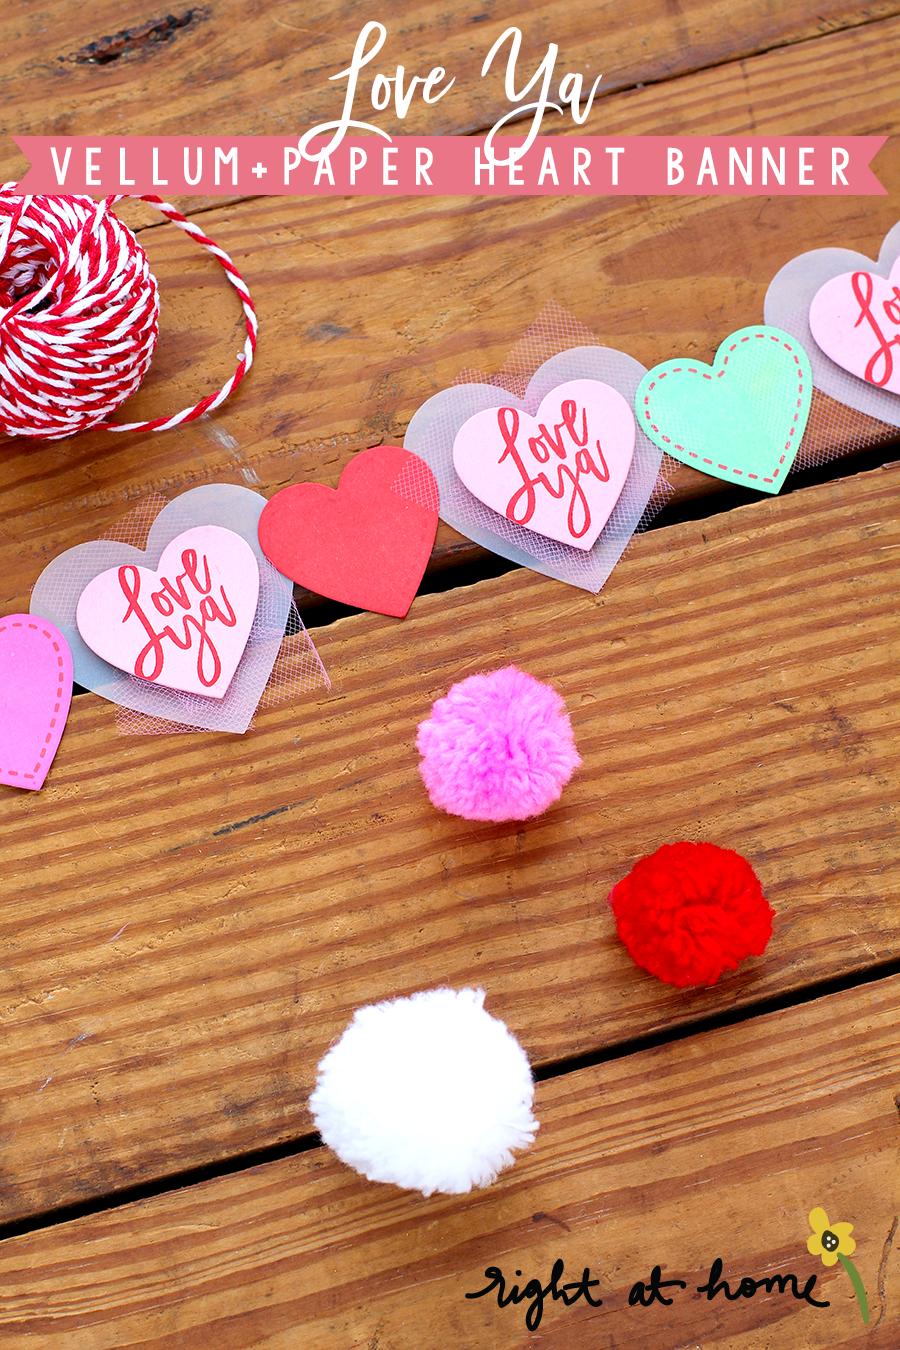 Day #10: Love Ya Vellum + Paper Heart Banner // rightathomeshop.com/blog